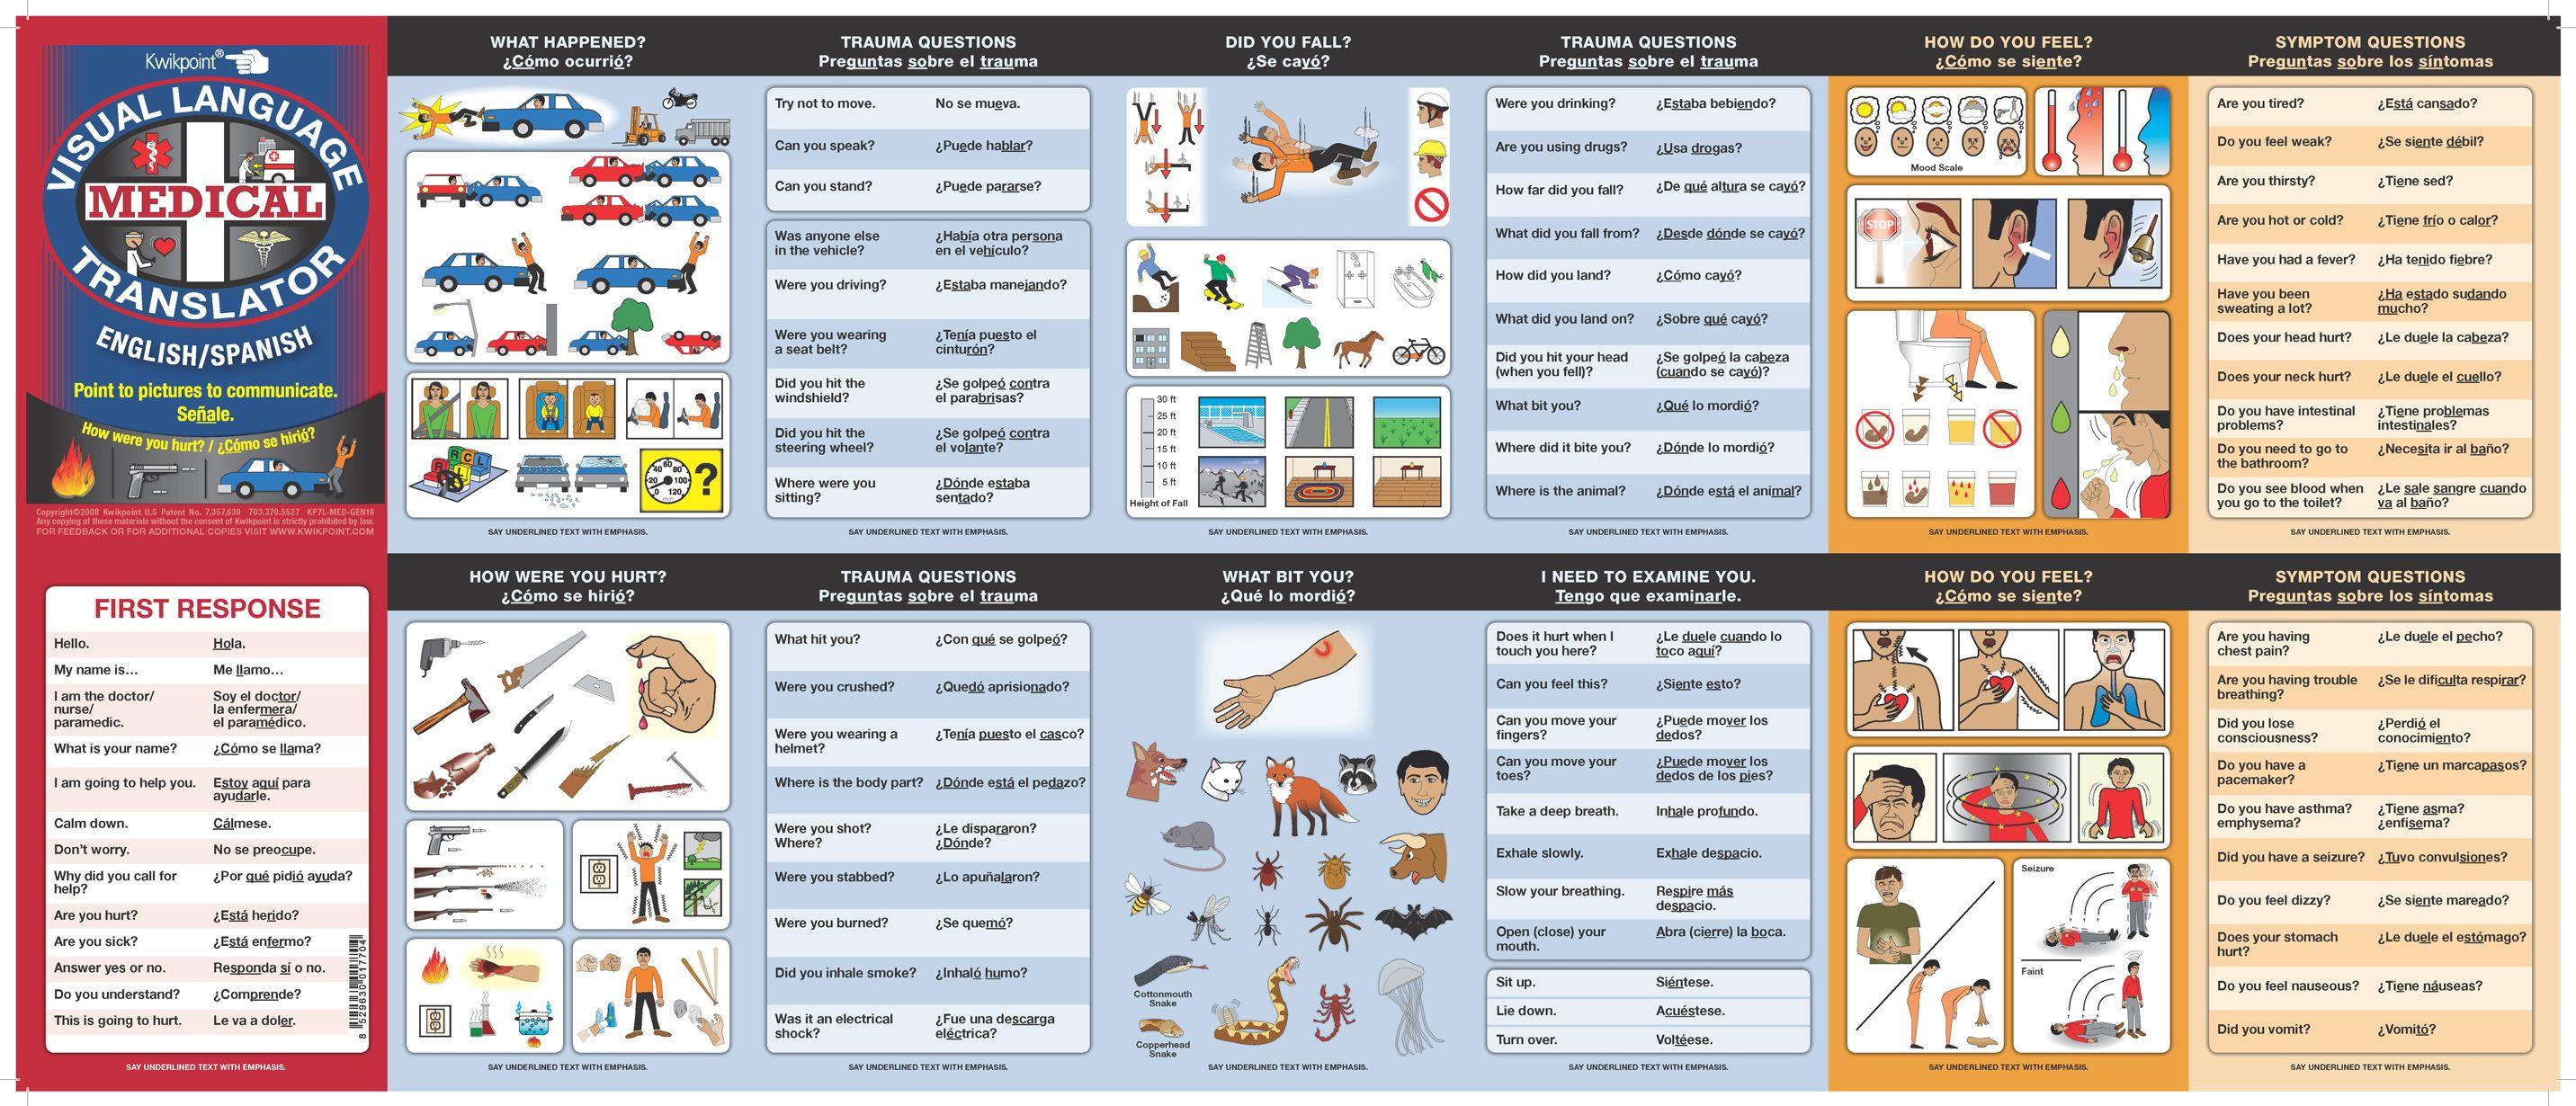 Medical Spanish Terminology | English/Spanish Medical Visual Language Translator  sc 1 st  Pinterest & Medical Spanish Terminology | English/Spanish Medical Visual ...